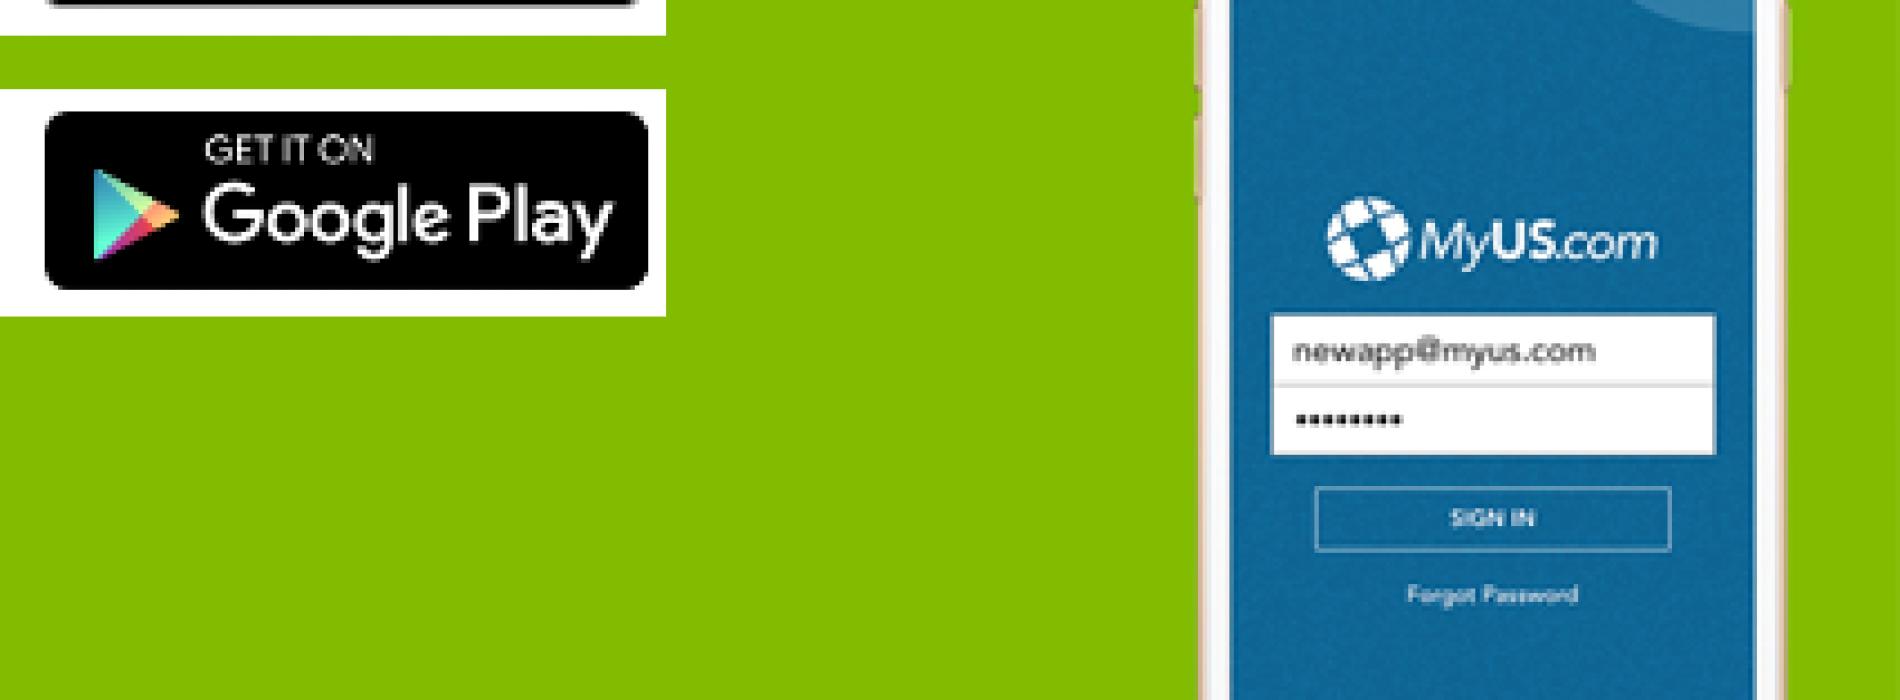 MyUS اضافت برنامج للاندرويد والايفون لمتابعة الشحنات والطلبات